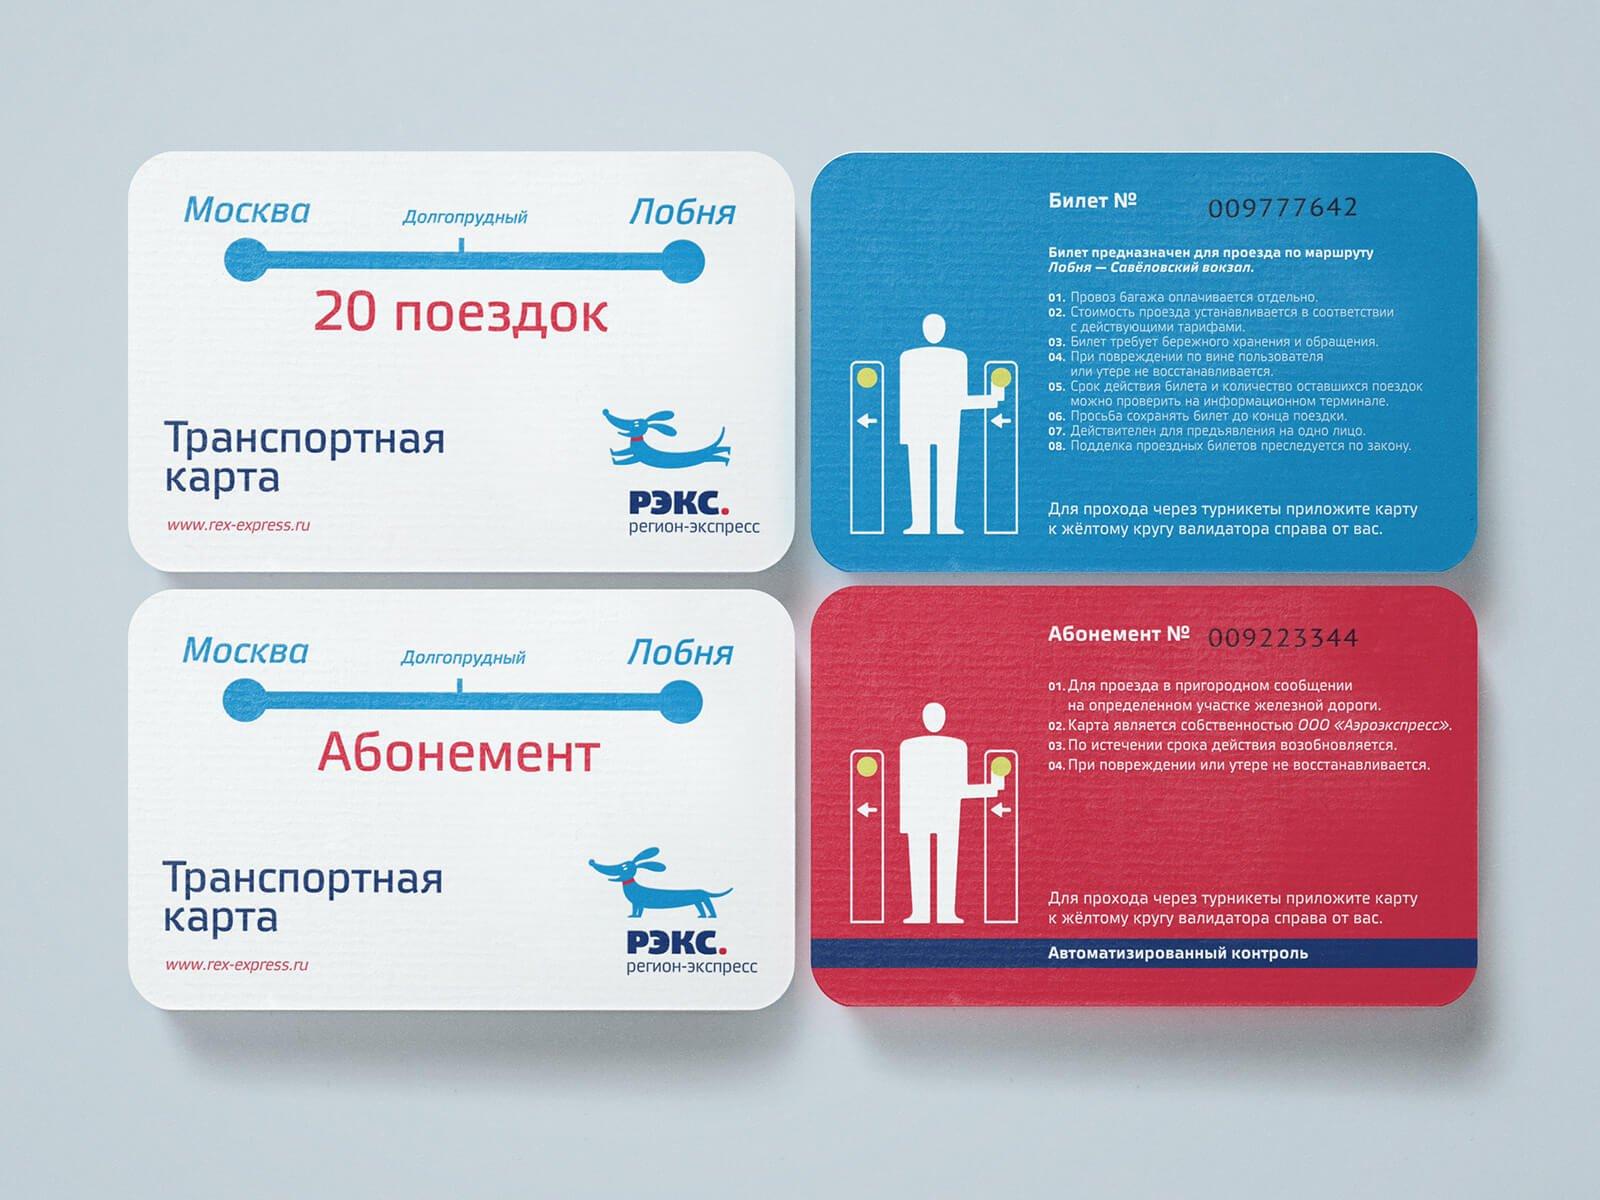 билет и абонемент РЭКС